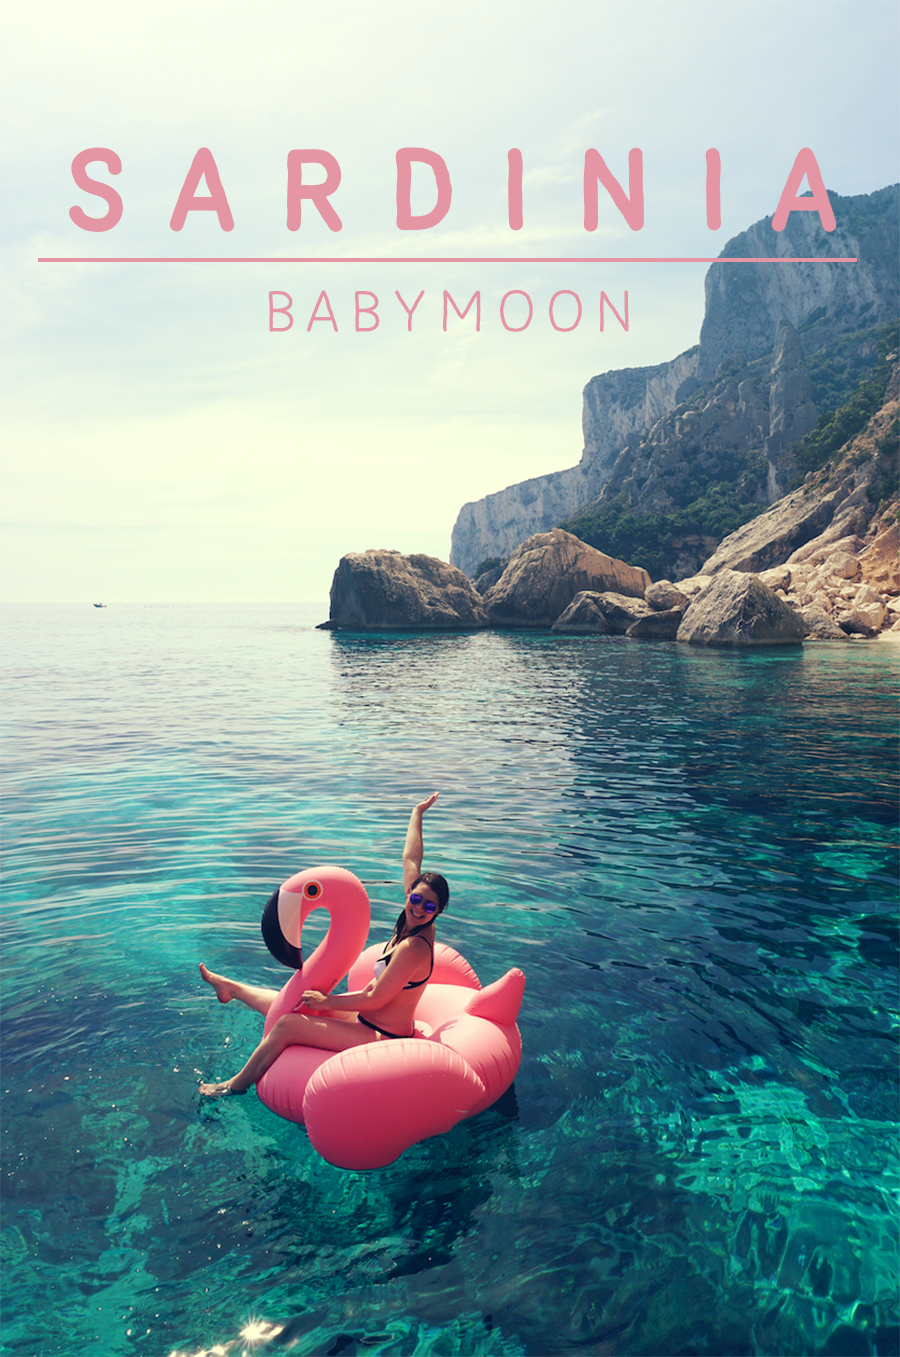 maybeyoulike_babymoon_sardinia_1